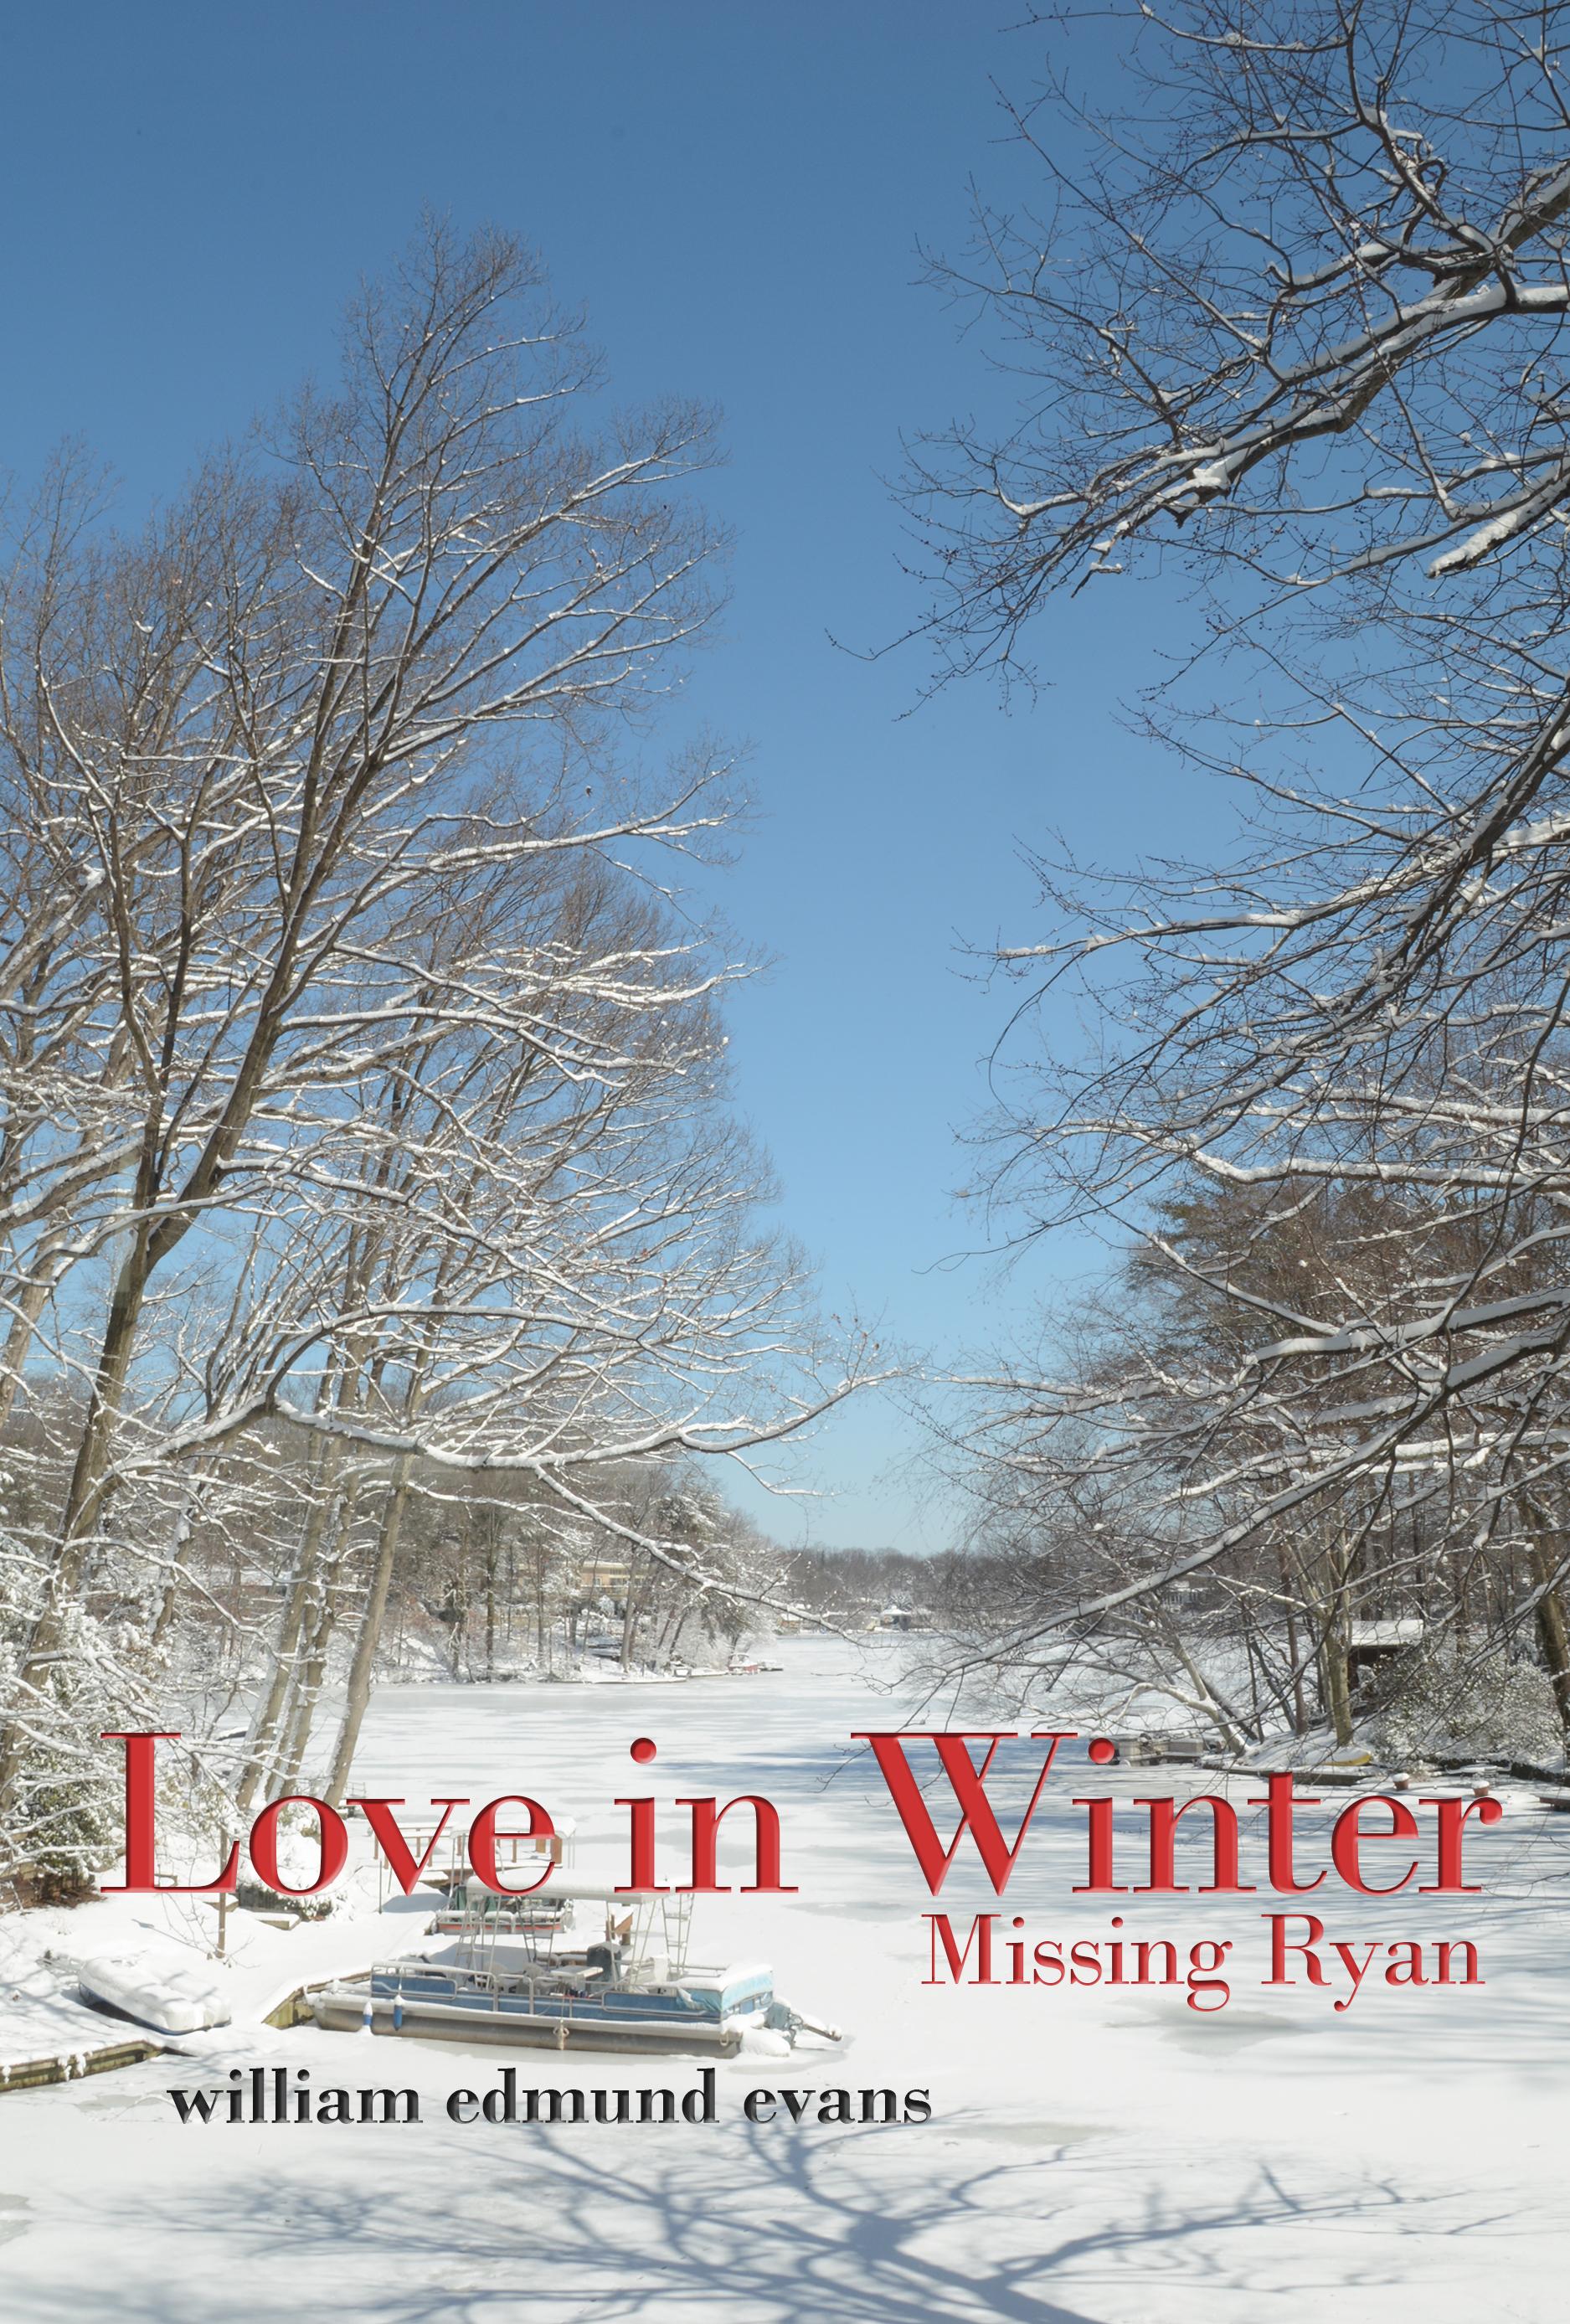 Love.in.Winter.MIssing.Ryan.1.jpg